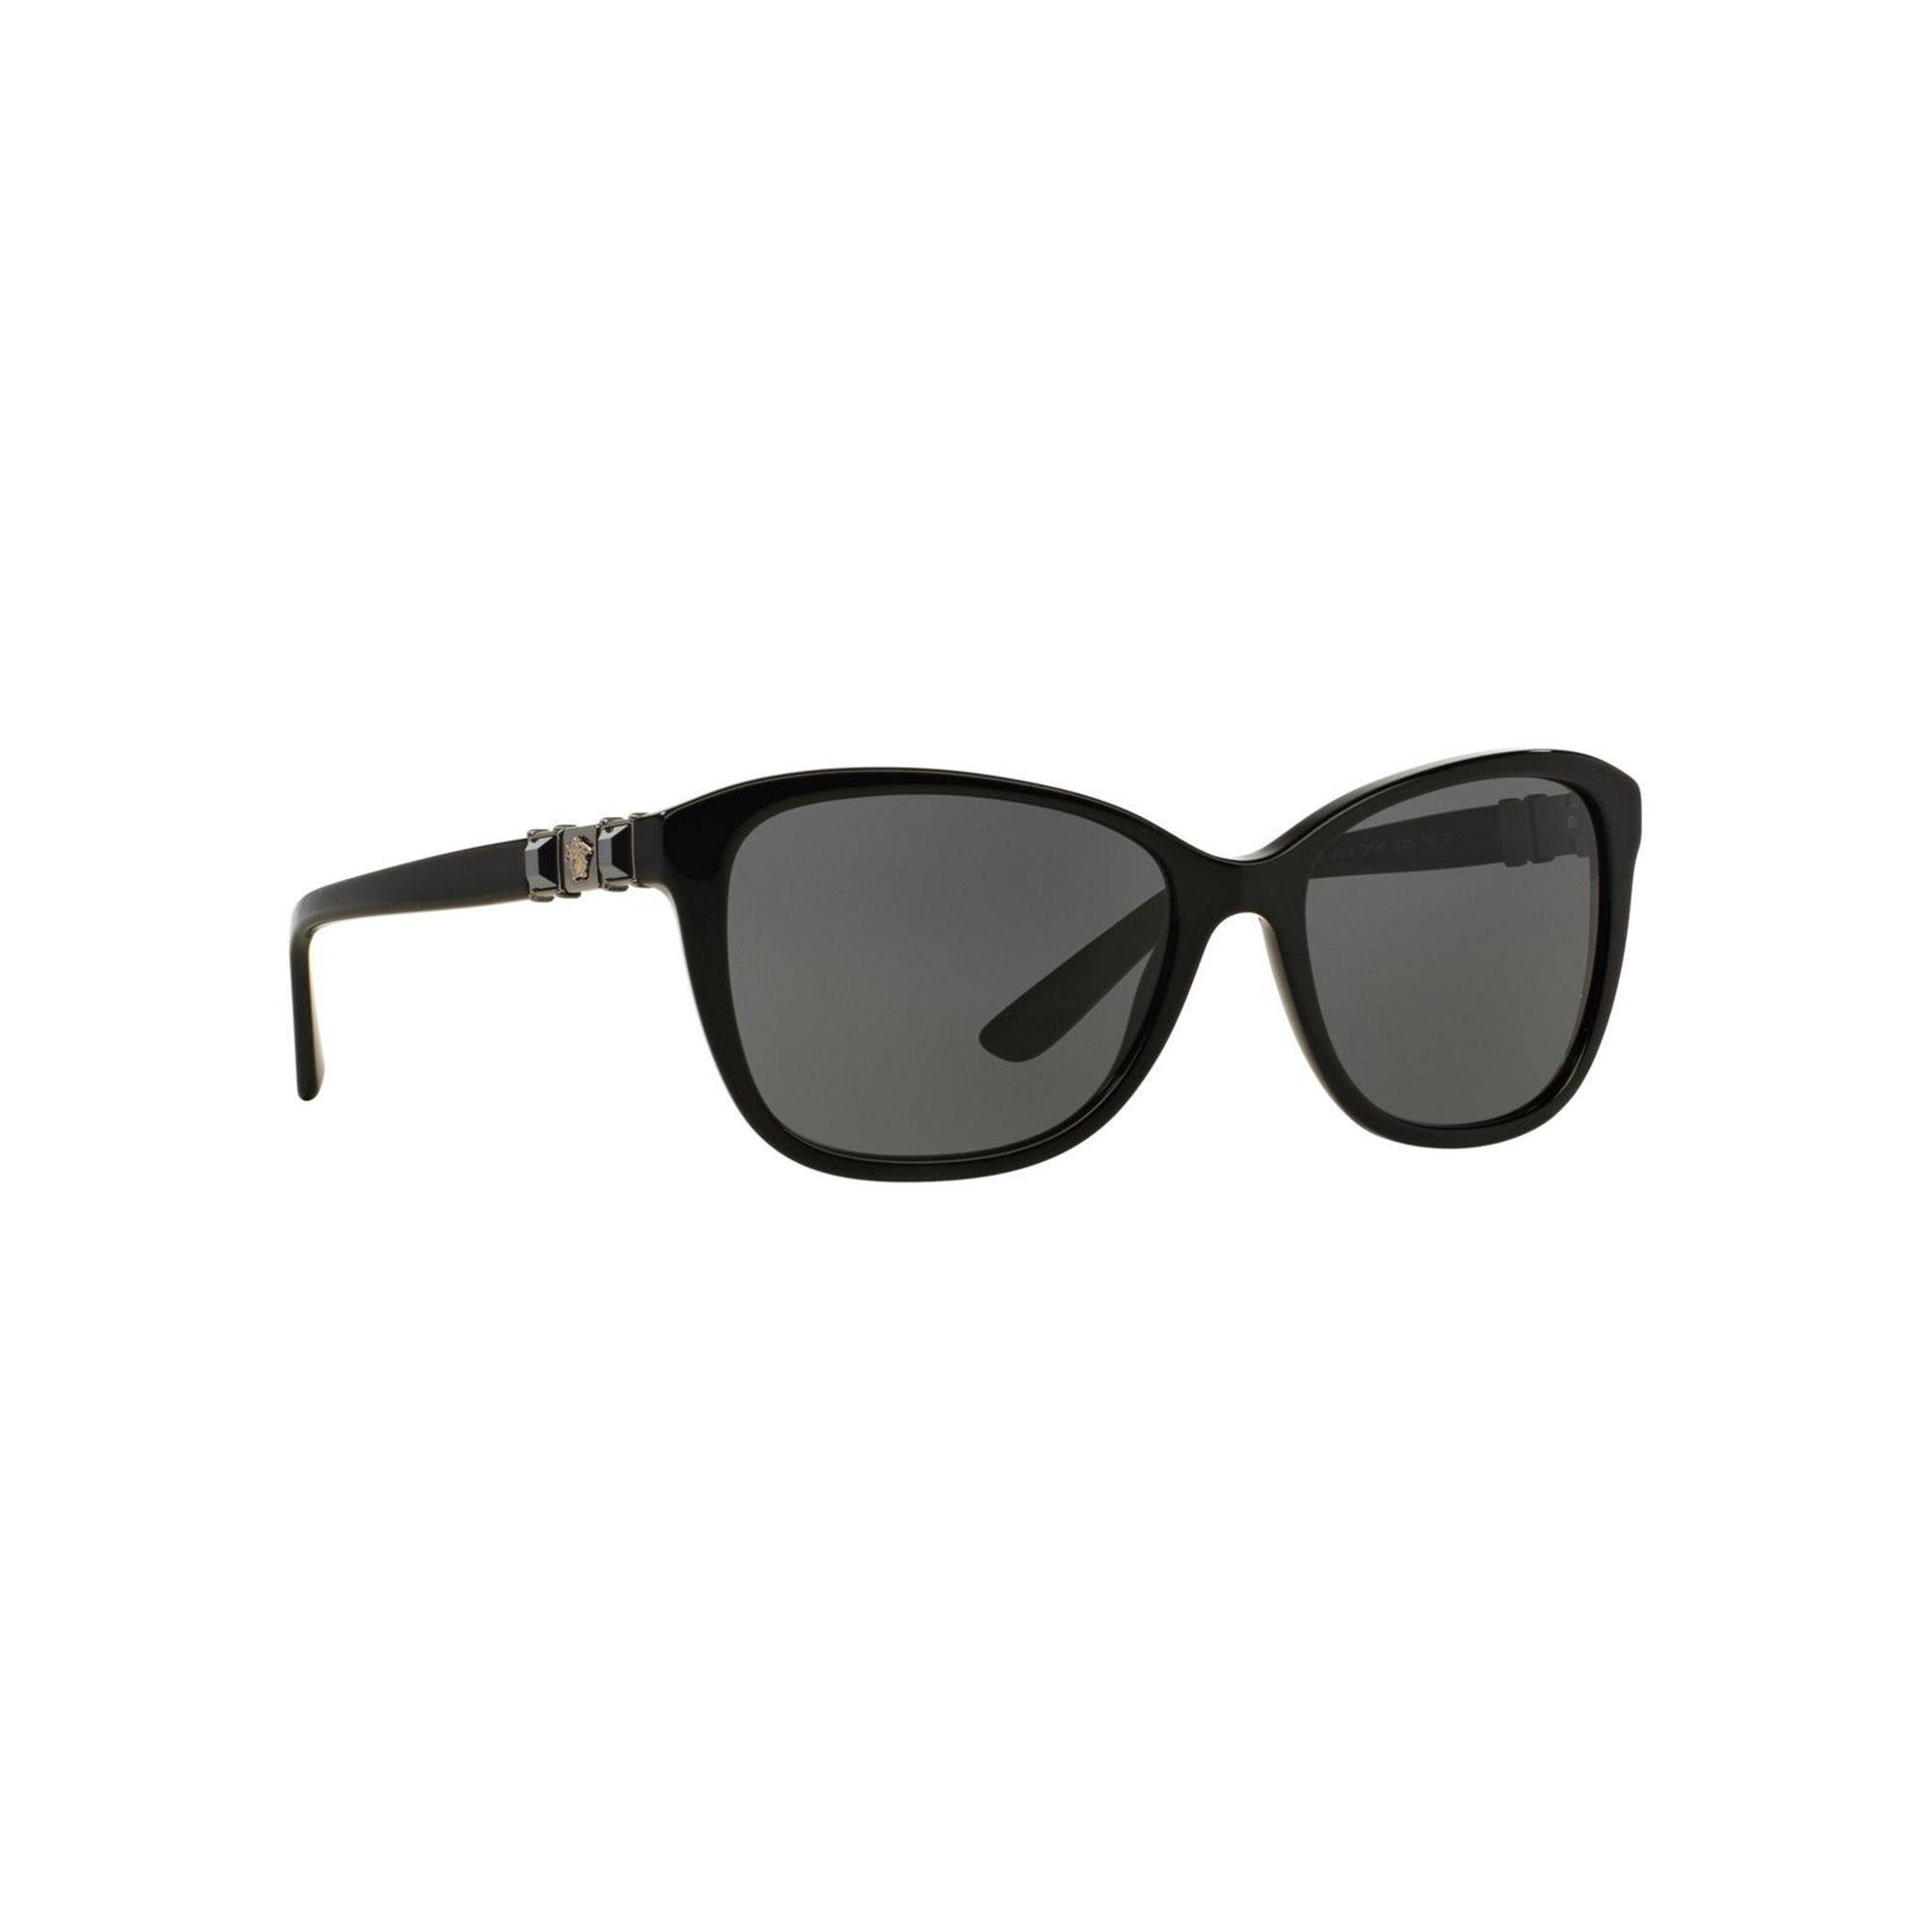 4a110ed1af00 Versace Black Ve4293b Cat Eye Sunglasses in Black - Lyst